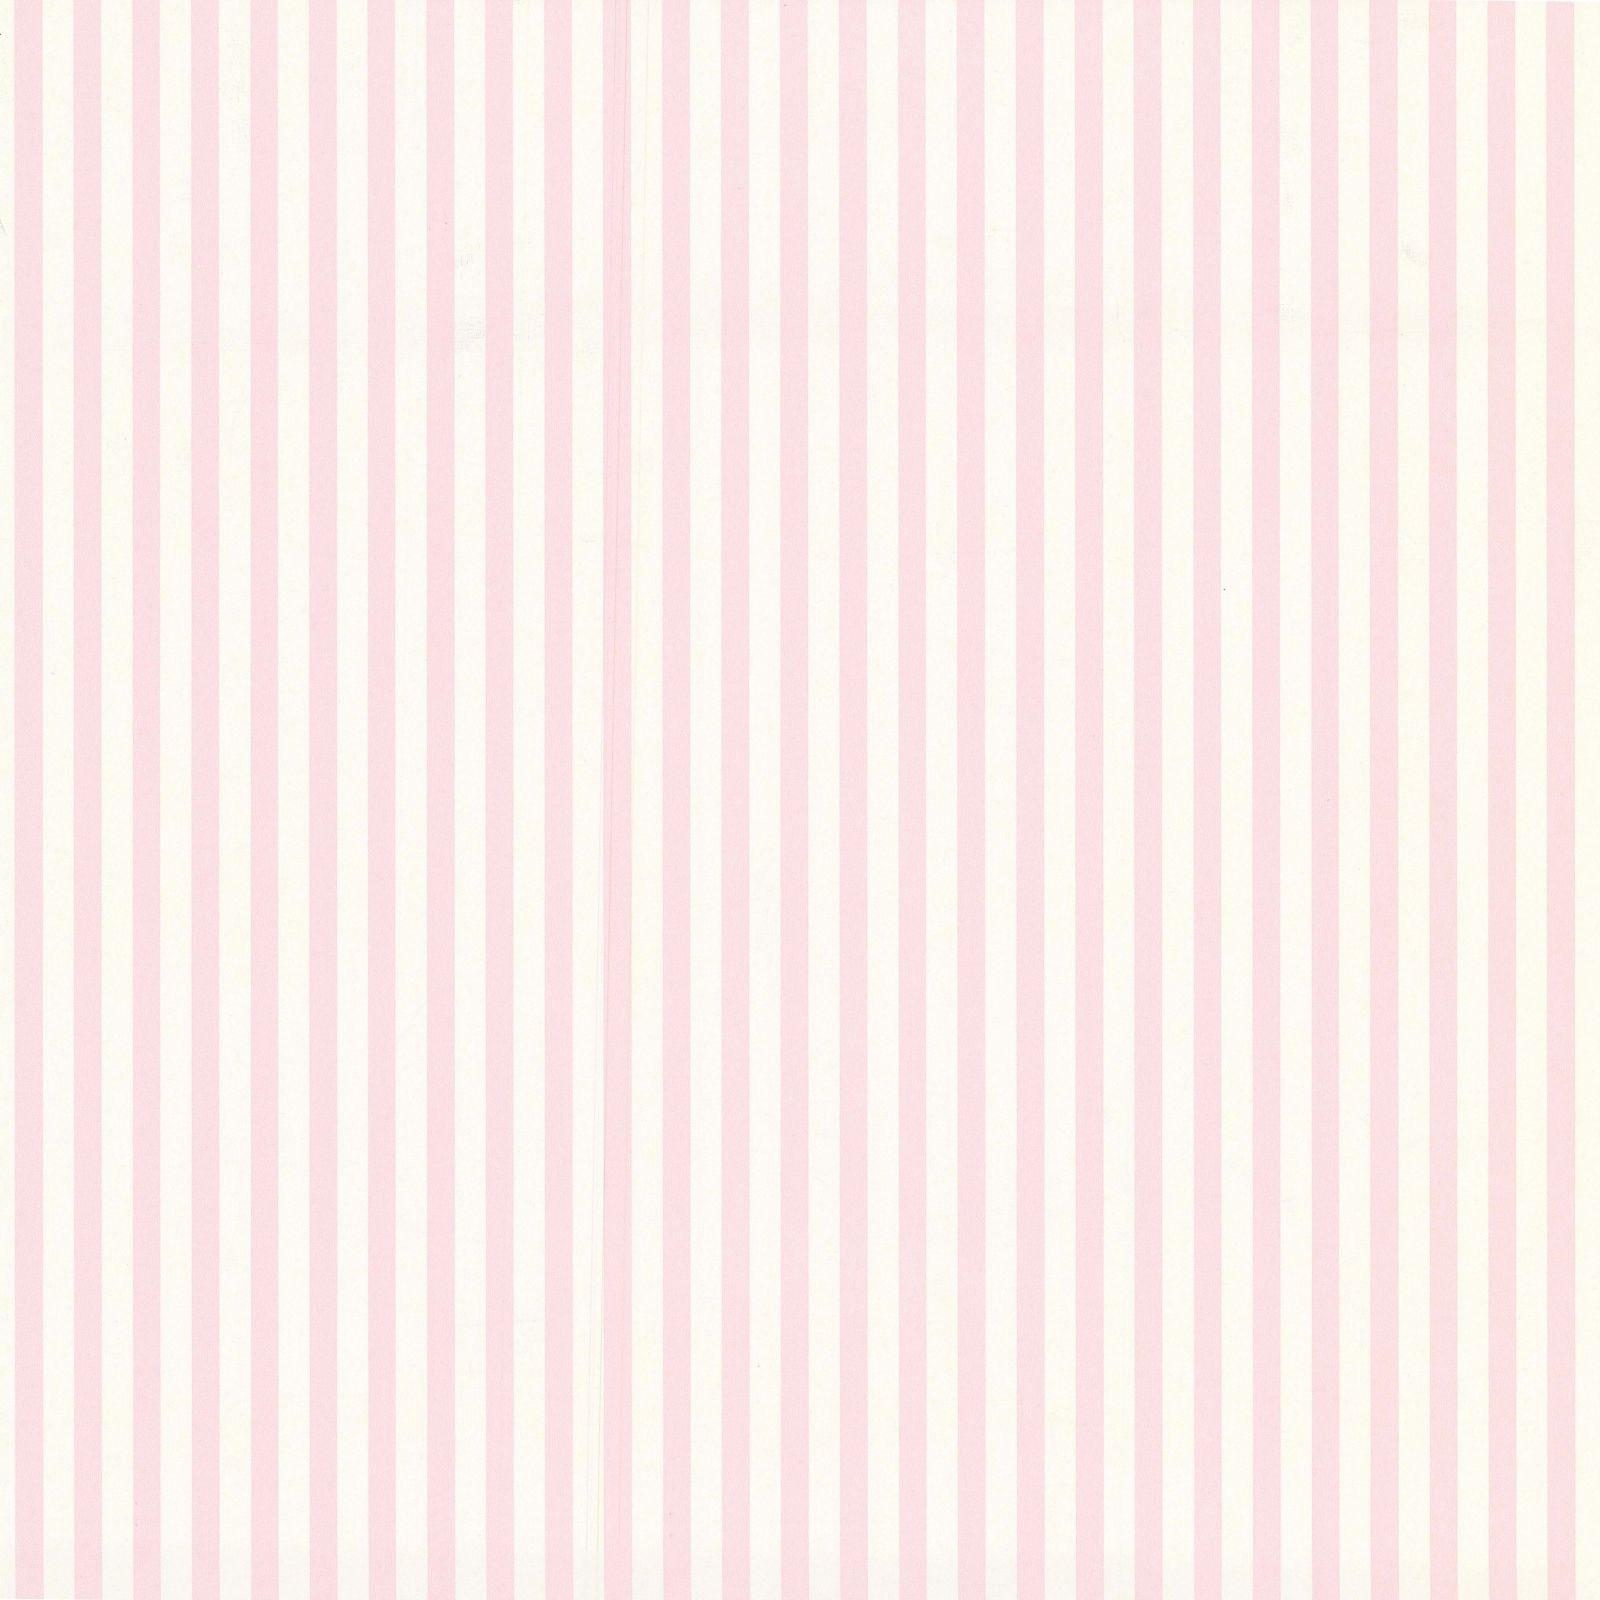 papier peint rayures roses et blanches tartine et chocolat chambre b b pinterest house. Black Bedroom Furniture Sets. Home Design Ideas